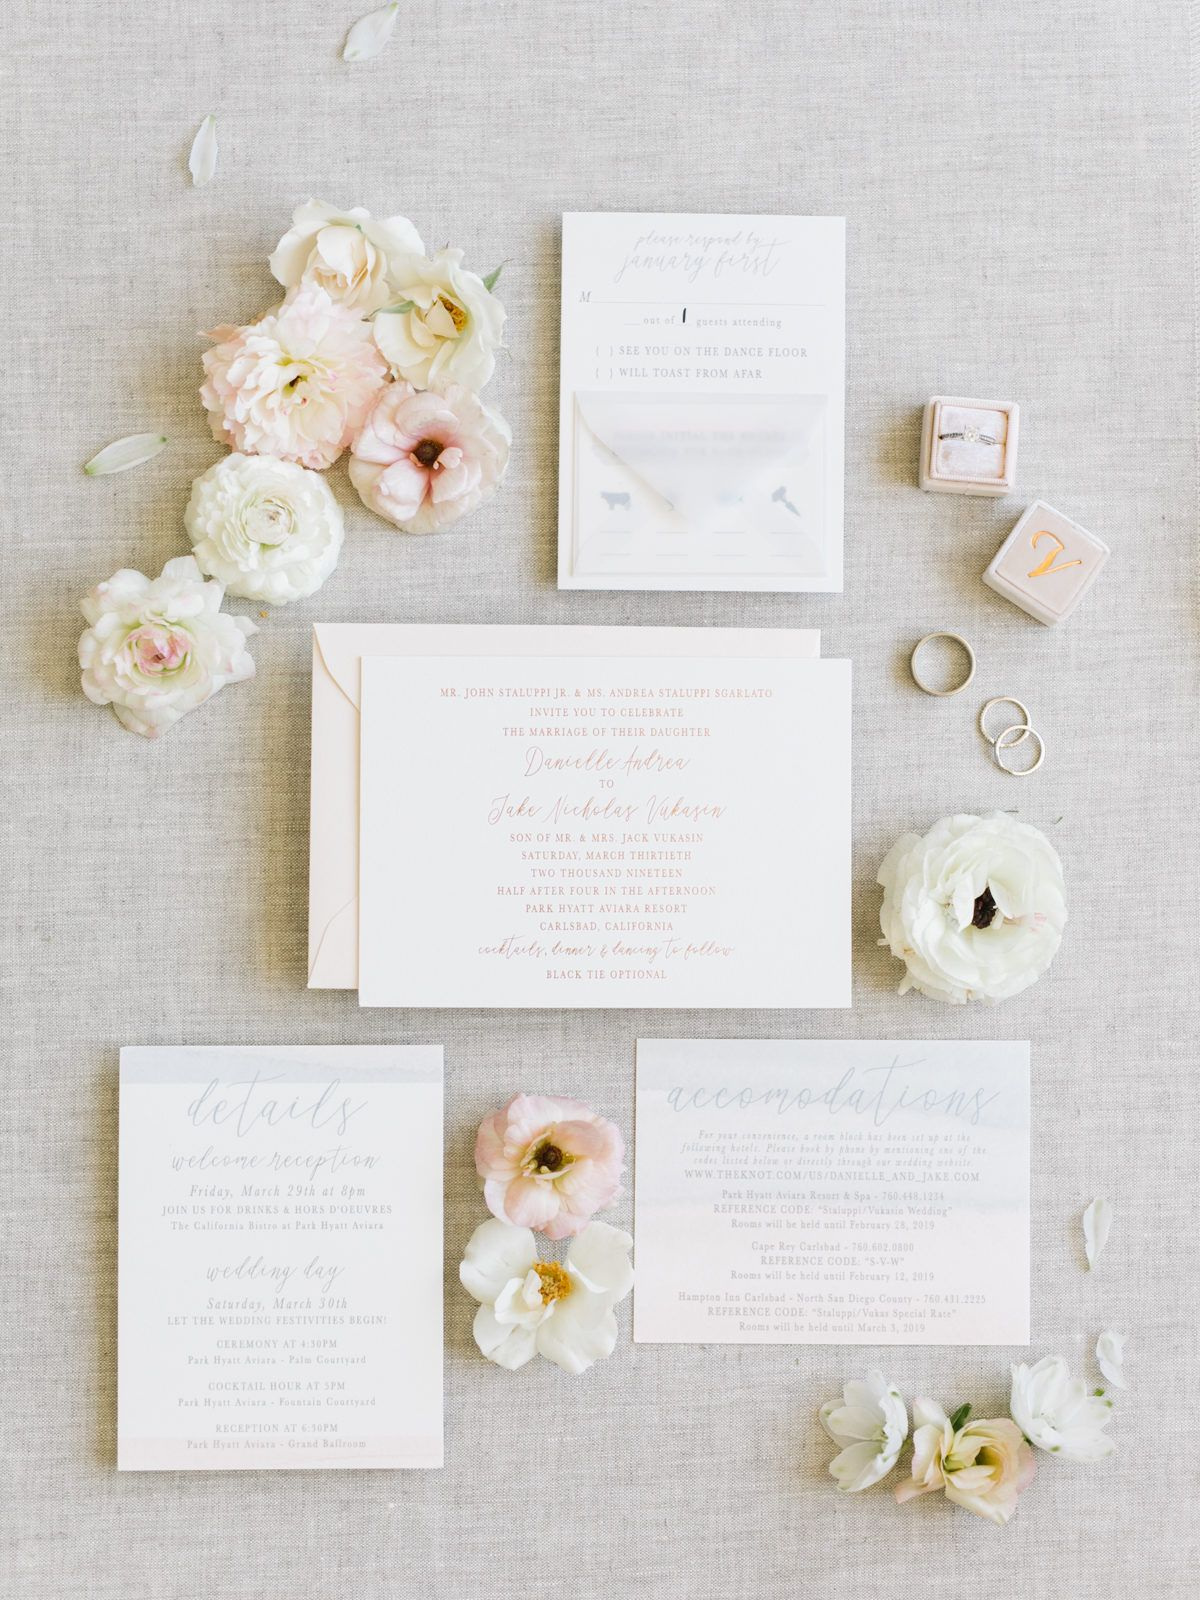 A Destination Wedding with Classic California Style at Park Hyatt